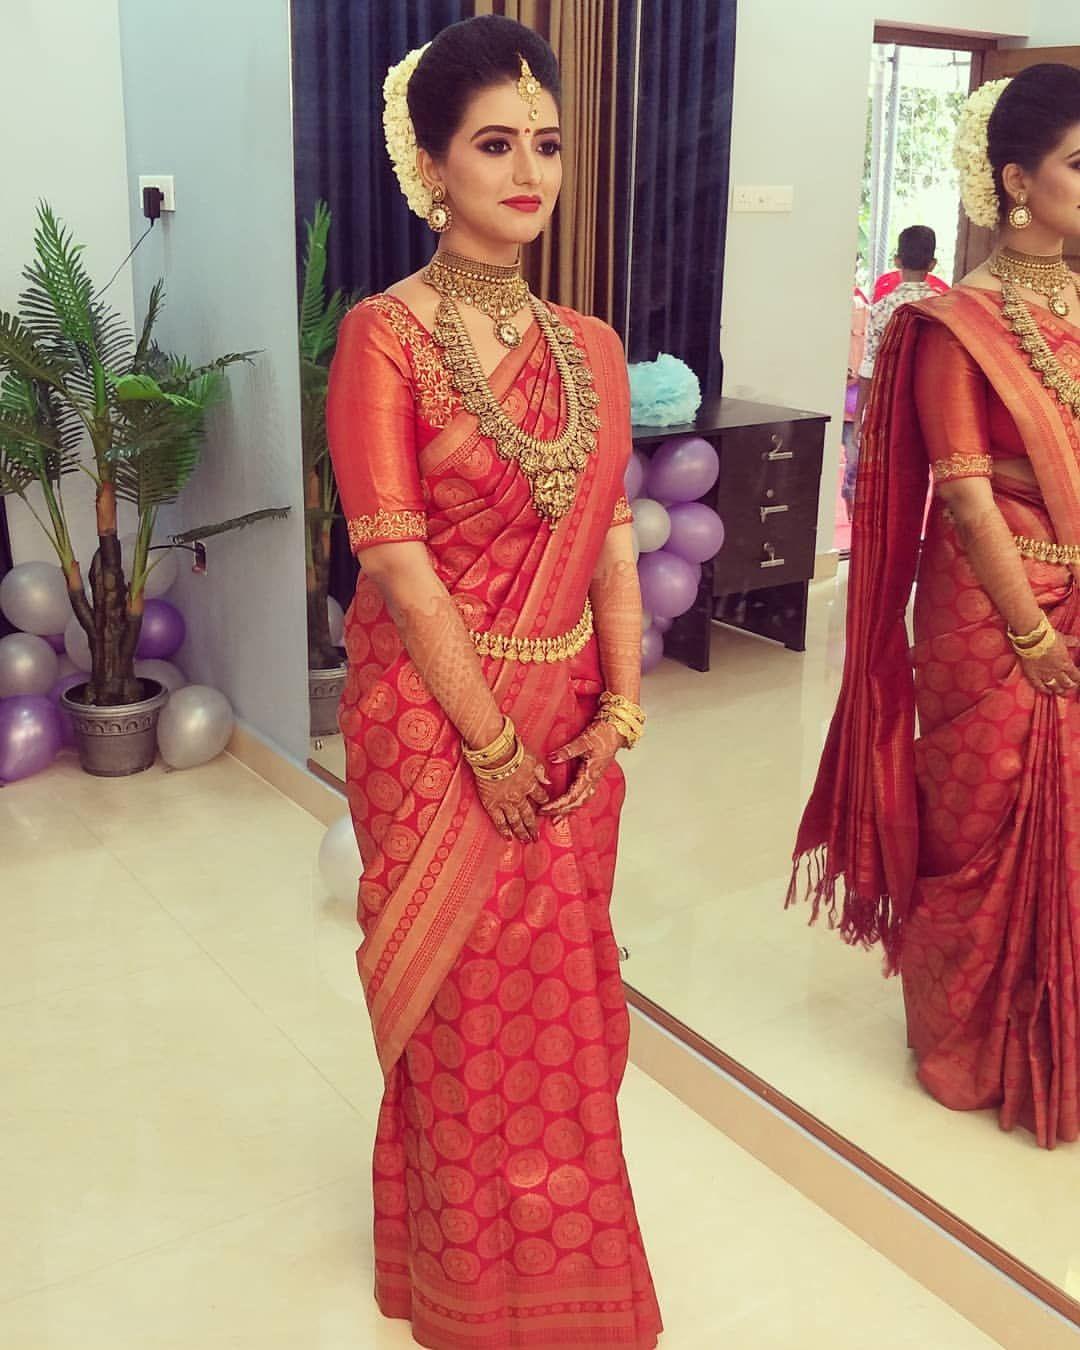 "Photo of Avinash S Chetia on Instagram: ""### Hindu Wedding Makeup Work In Kerala ### 💅💅💅💅💄💄💄💄"""